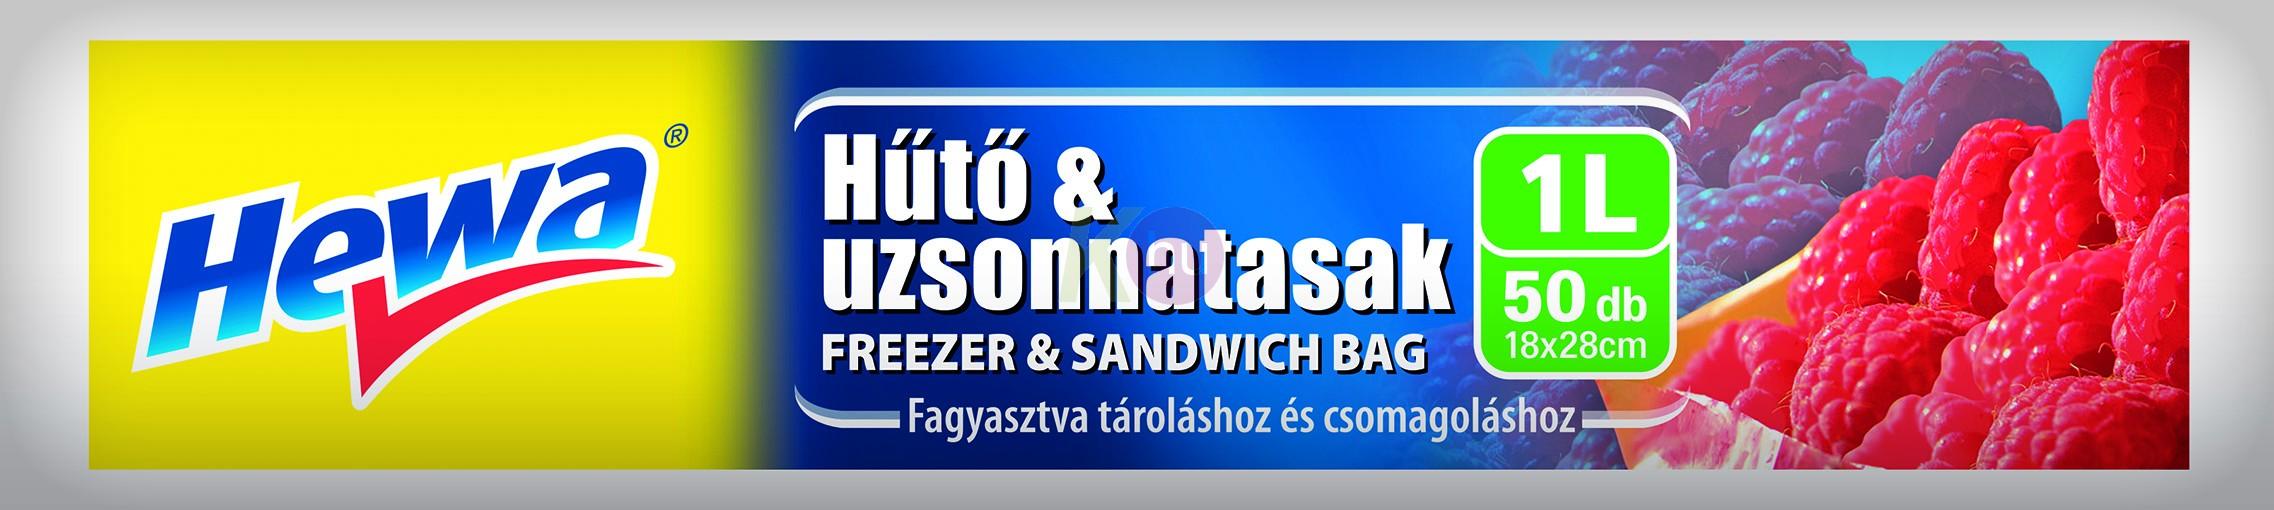 Hewa Hűtő & uzsonnatasak 1 l/50 db 11125073